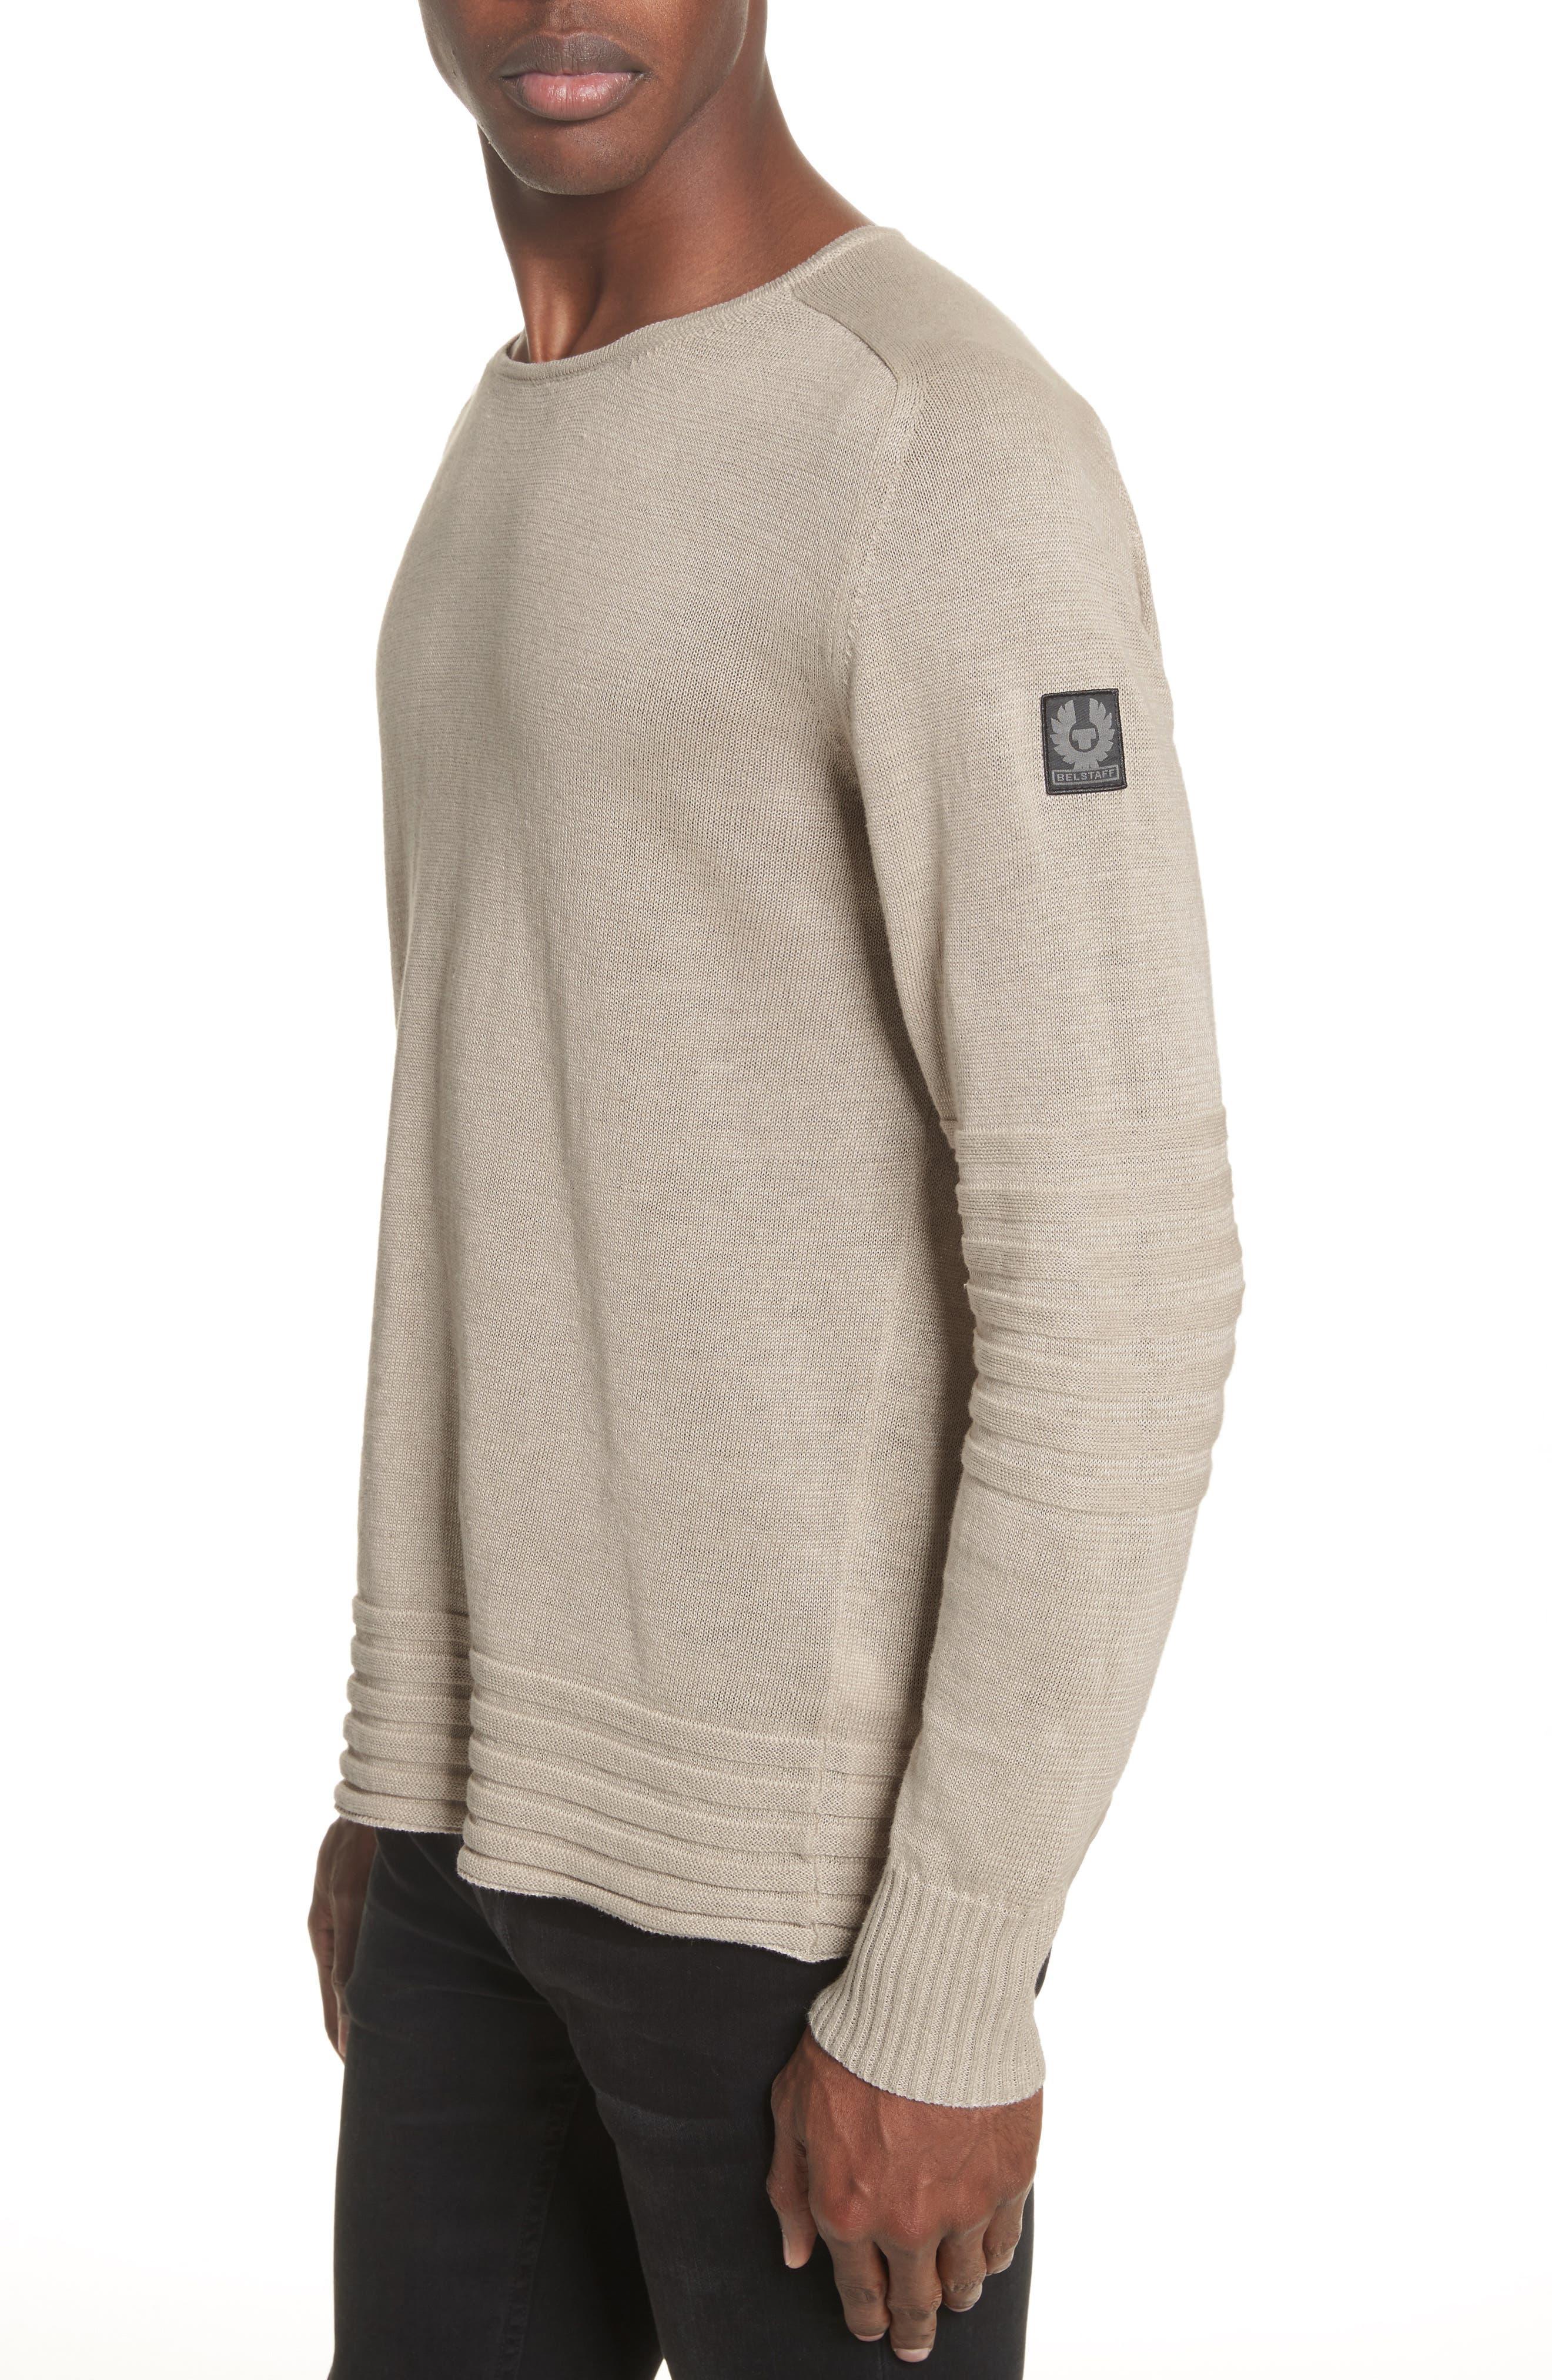 Exford Linen Crewneck Sweater,                         Main,                         color, 270